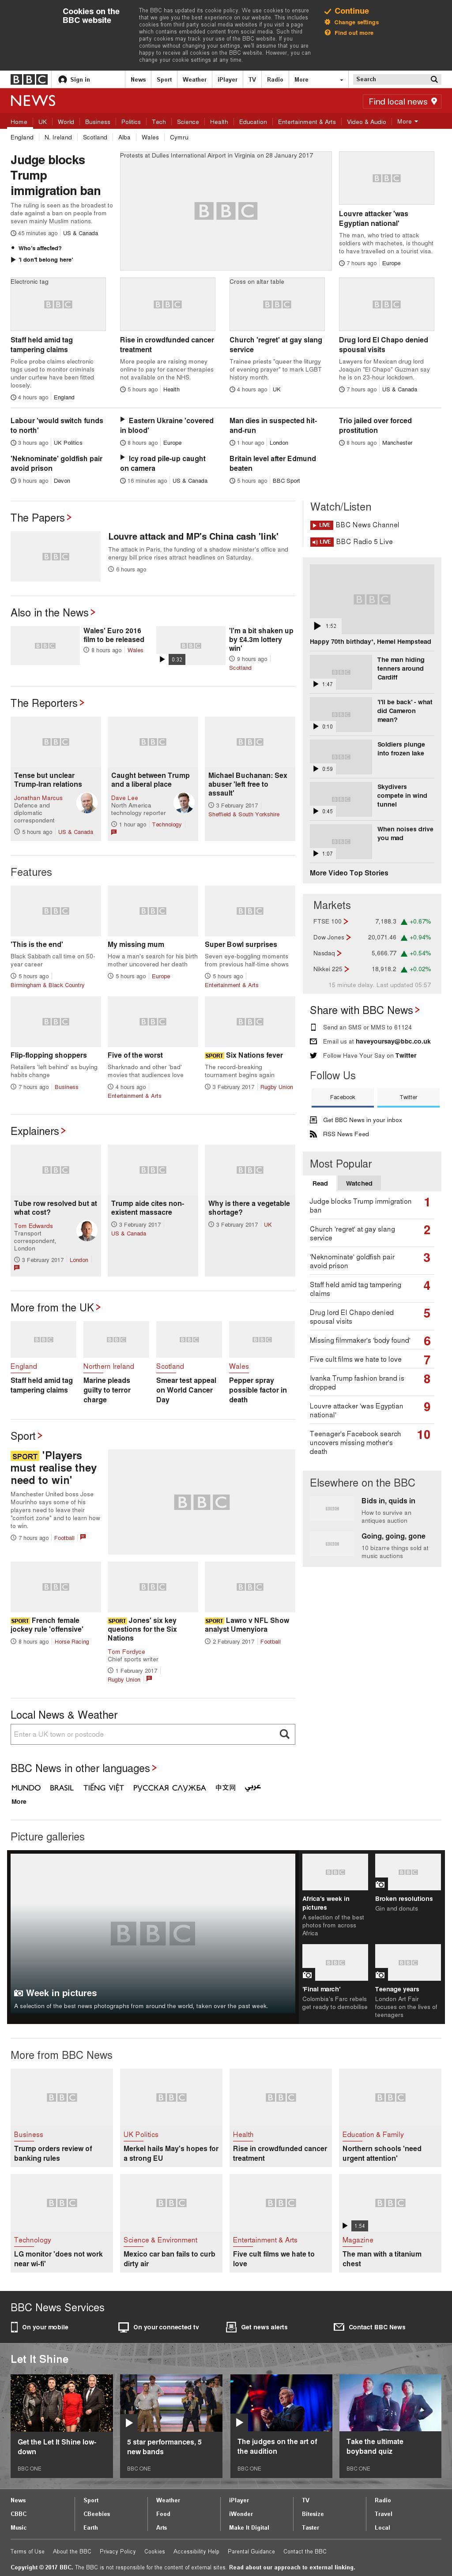 BBC at Saturday Feb. 4, 2017, 6 a.m. UTC